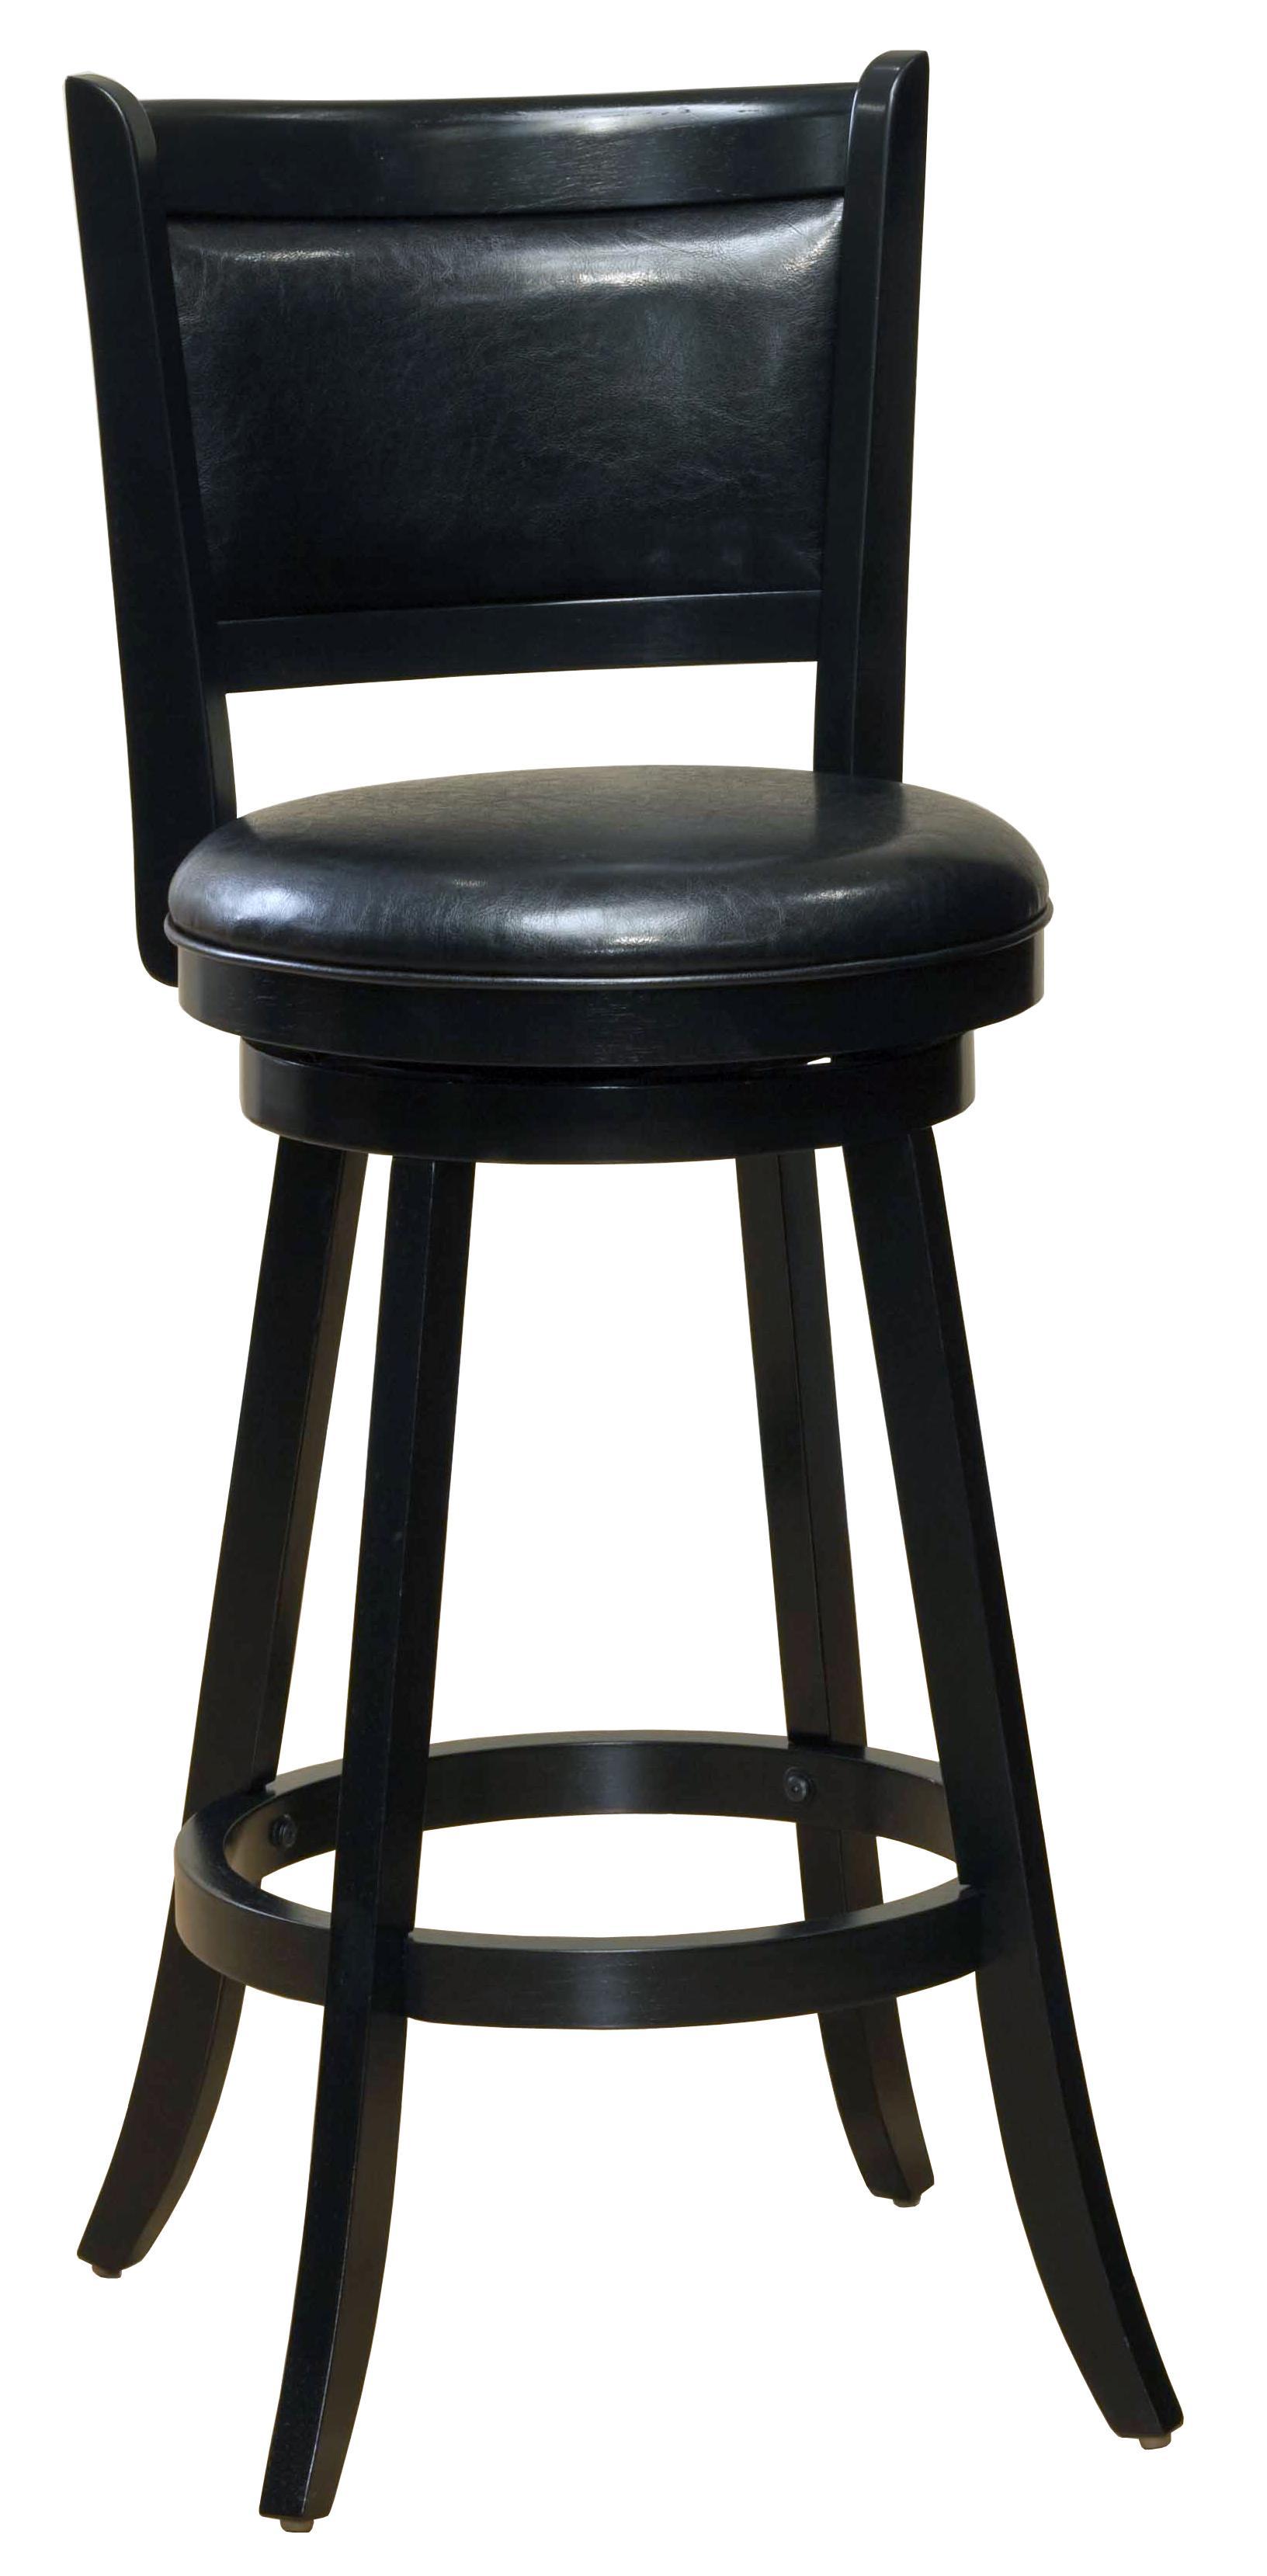 "Hillsdale Wood Stools 29"" Bar Height Dennery Swivel Bar Stool - Item Number: 4472-831"